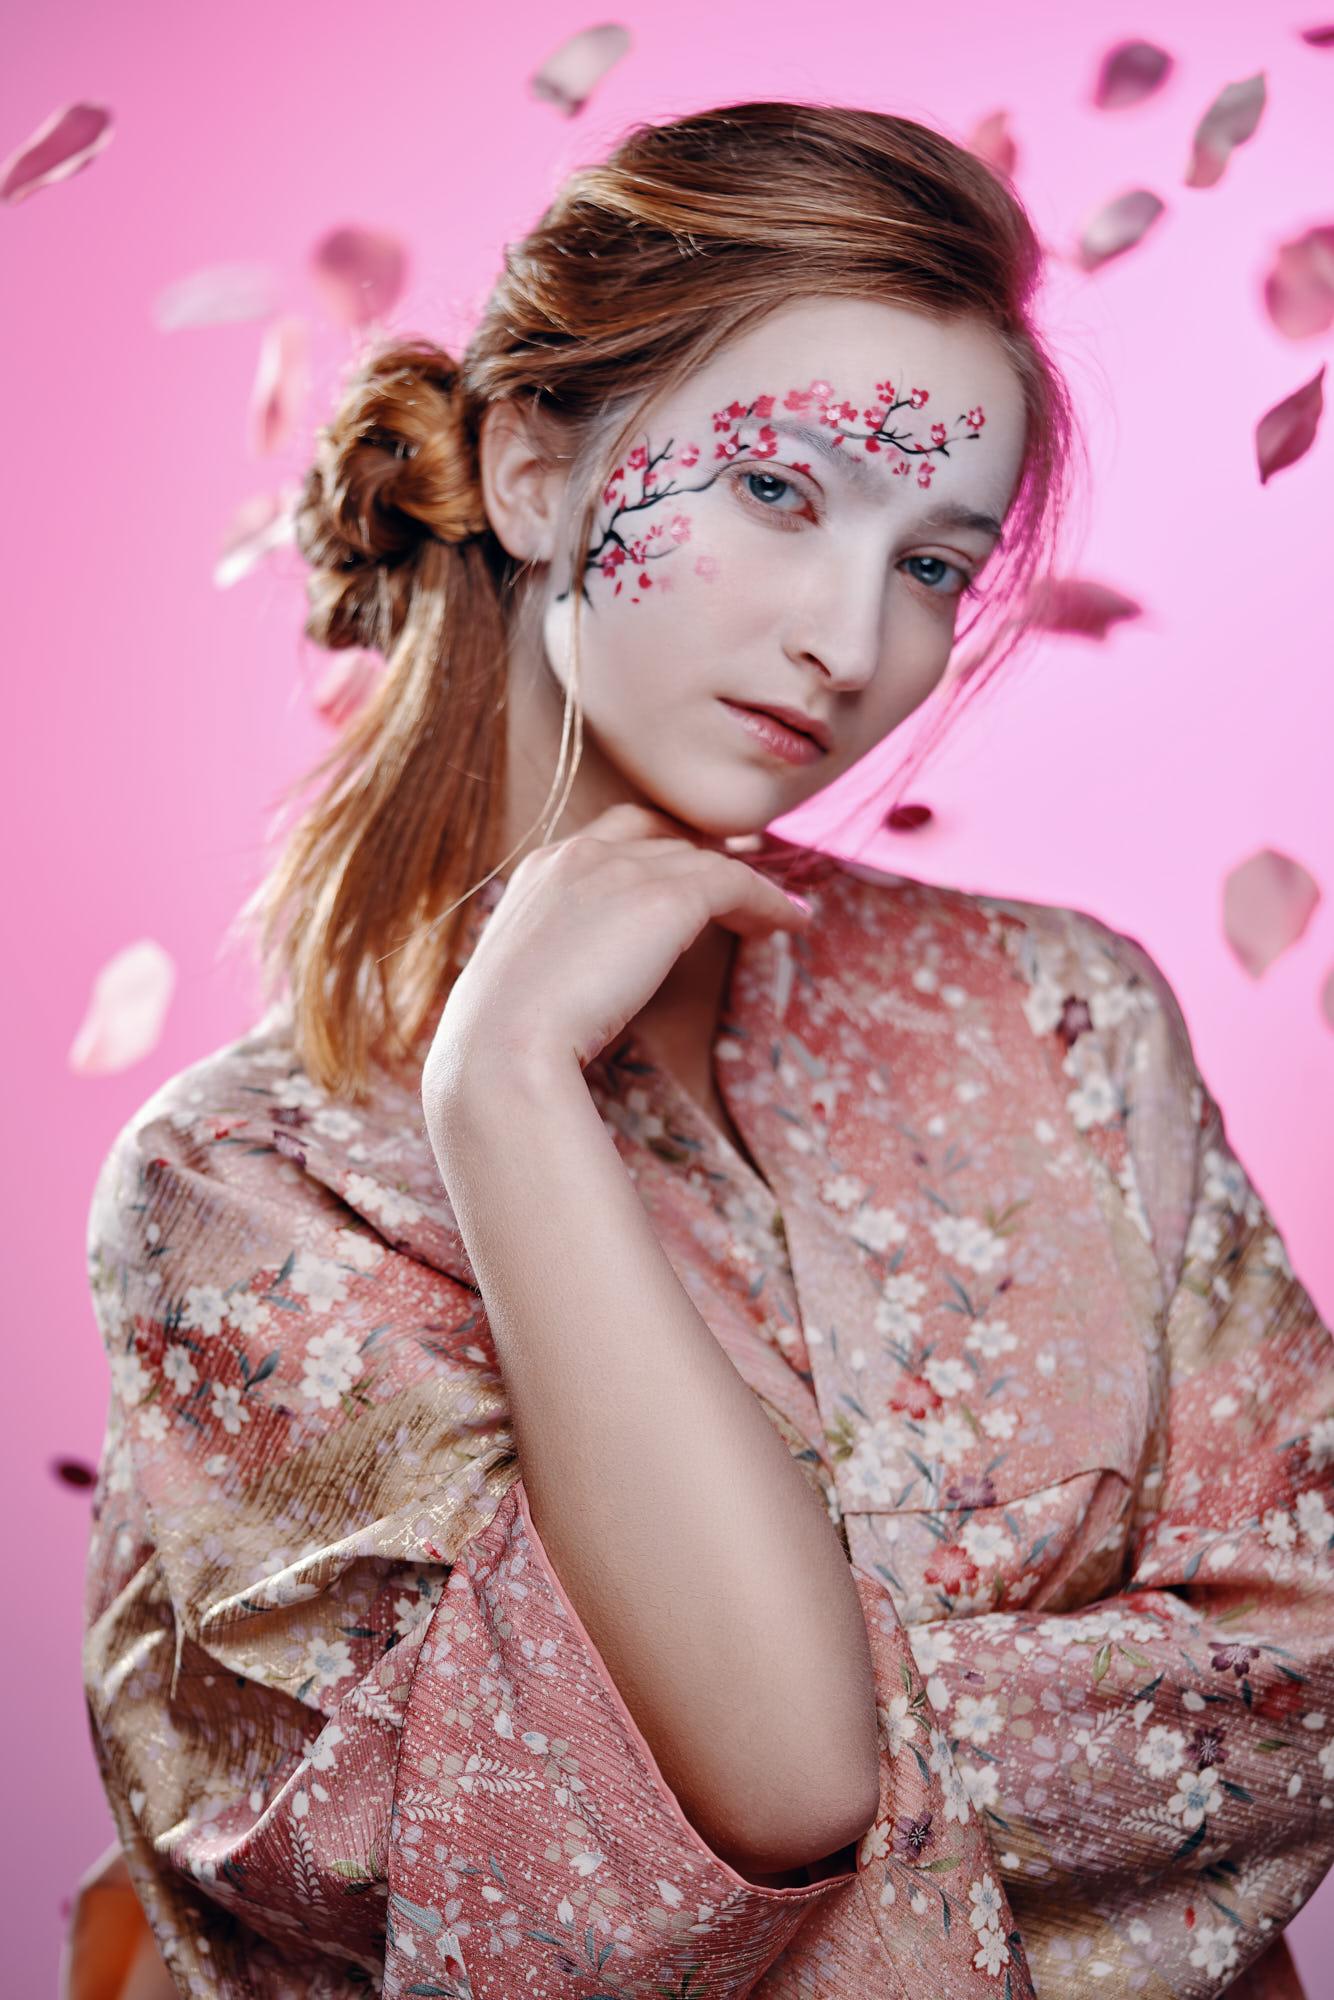 Lex & Josh Tiffanys Pro Makeup Spring Studio Shoot with Mika 6.jpg